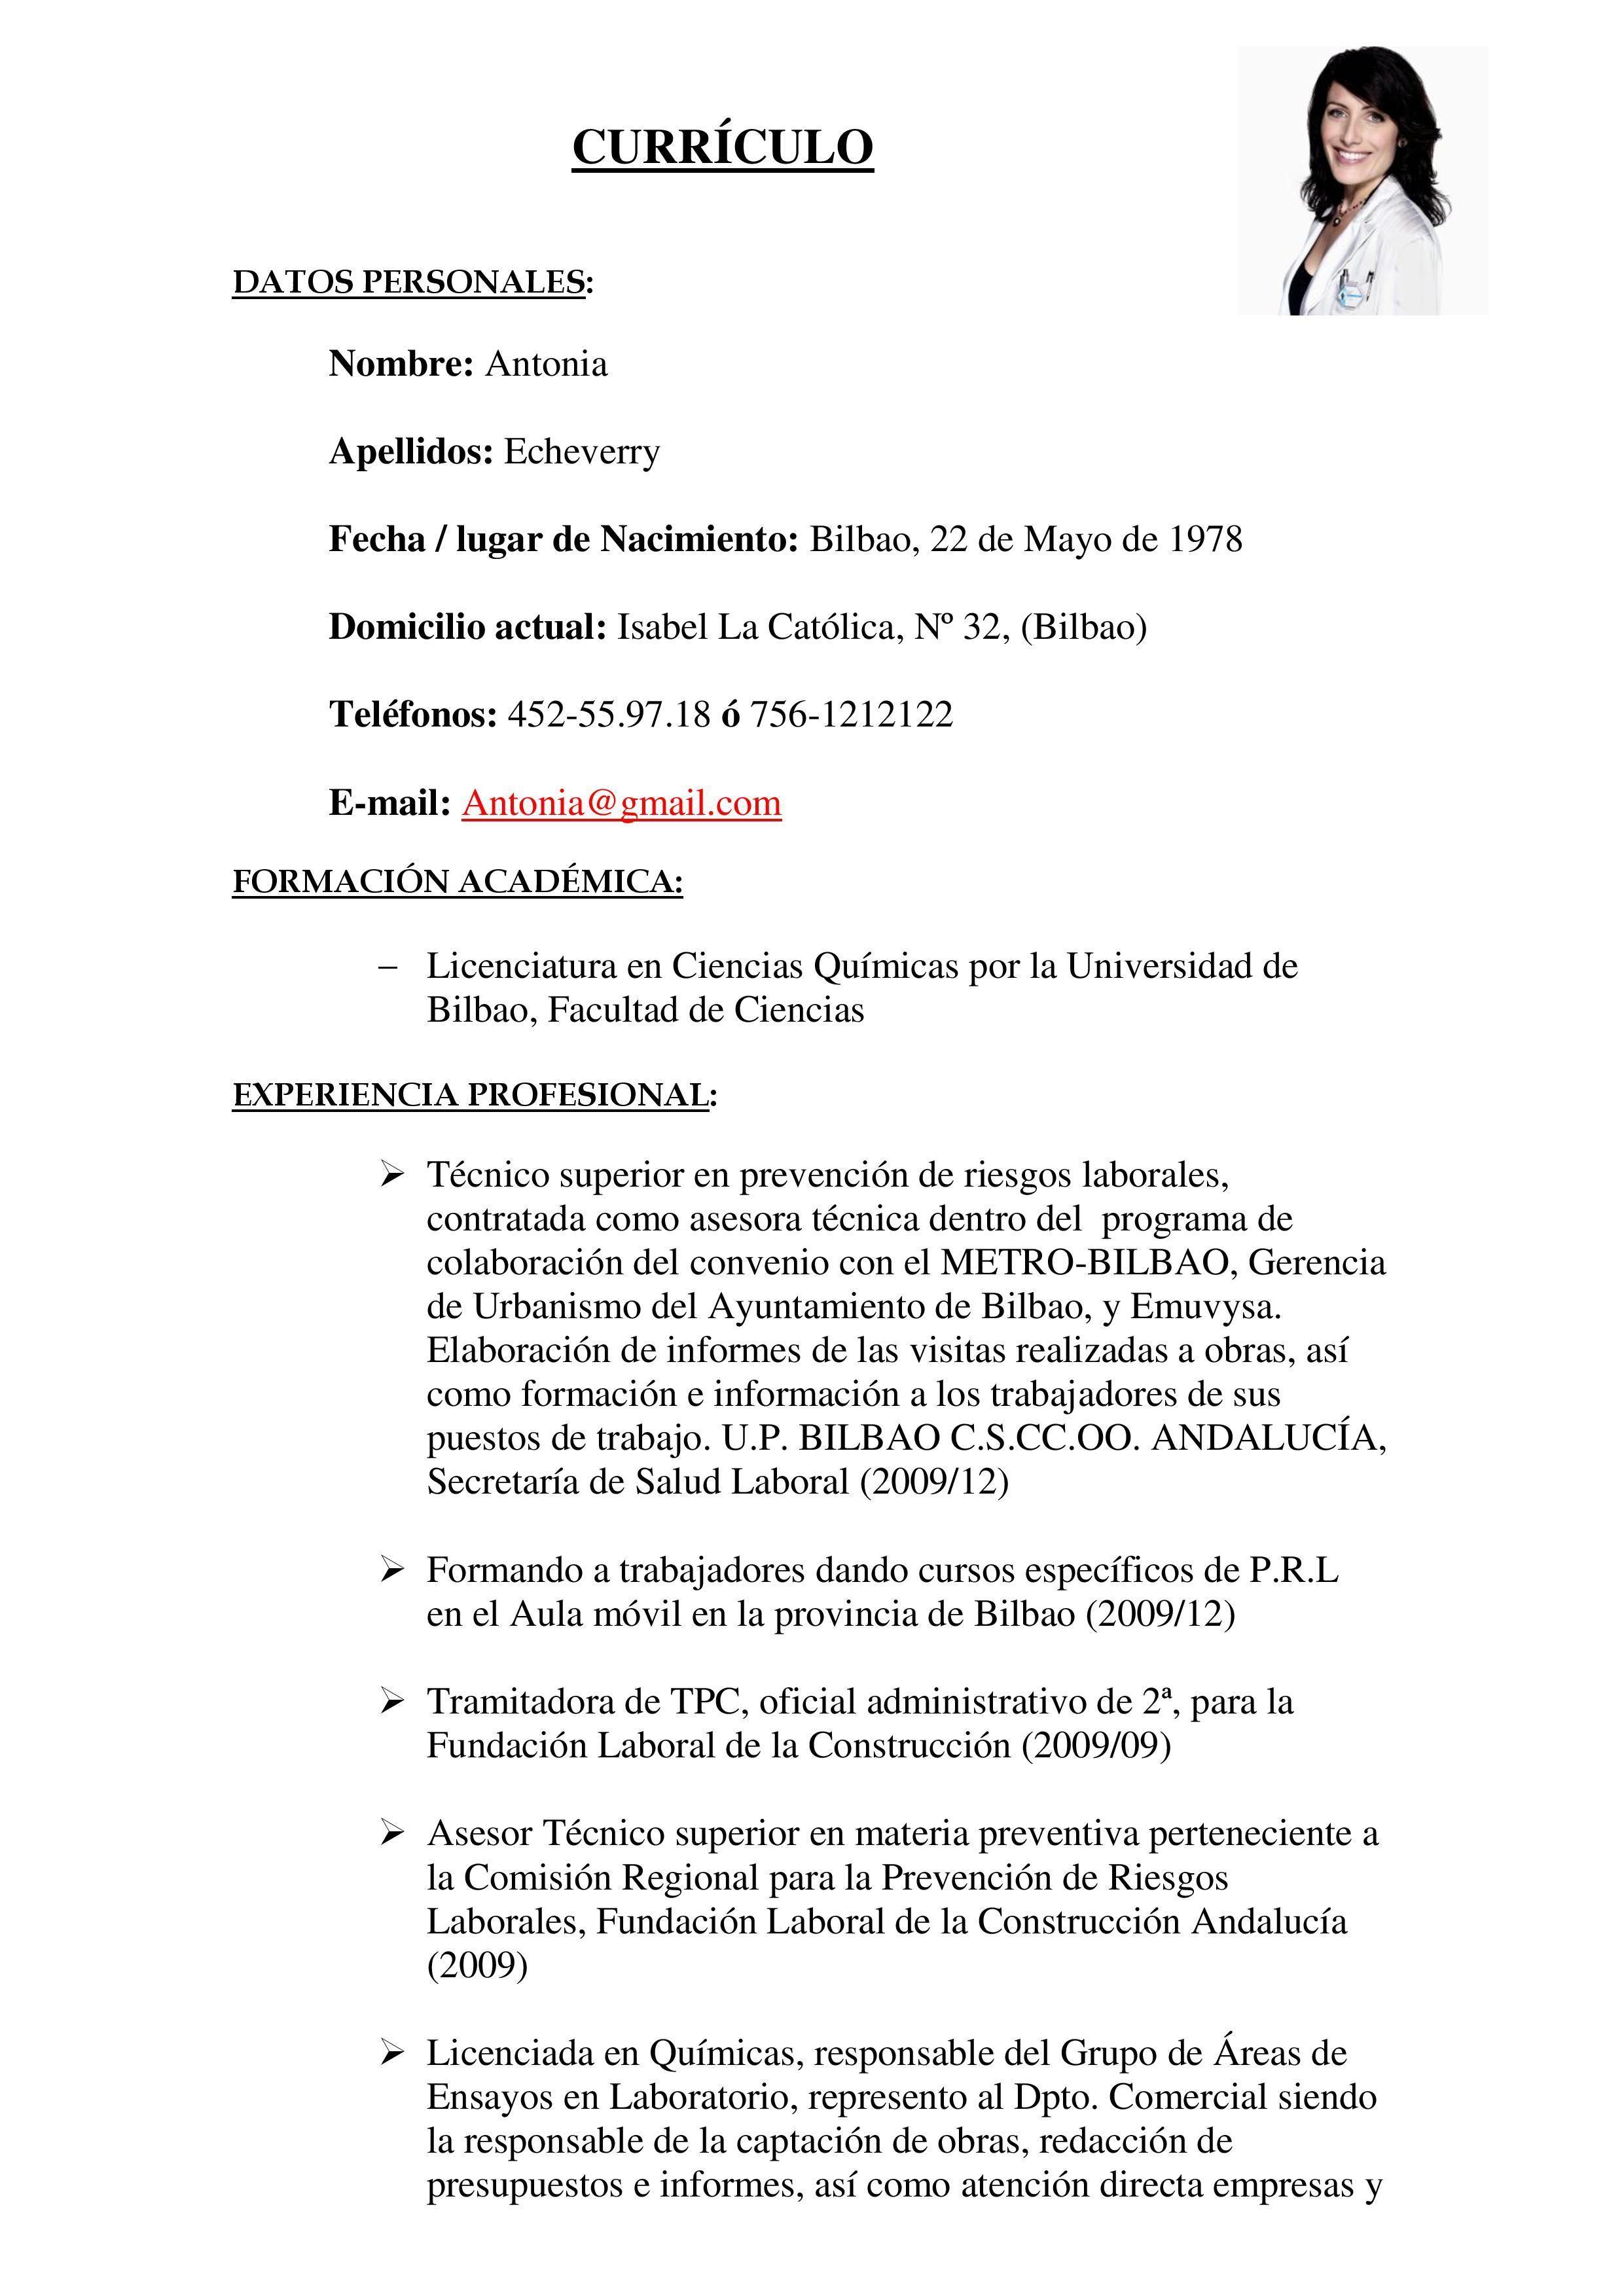 Modelo de currículum vitae para ciencias exactas | Pinterest ...